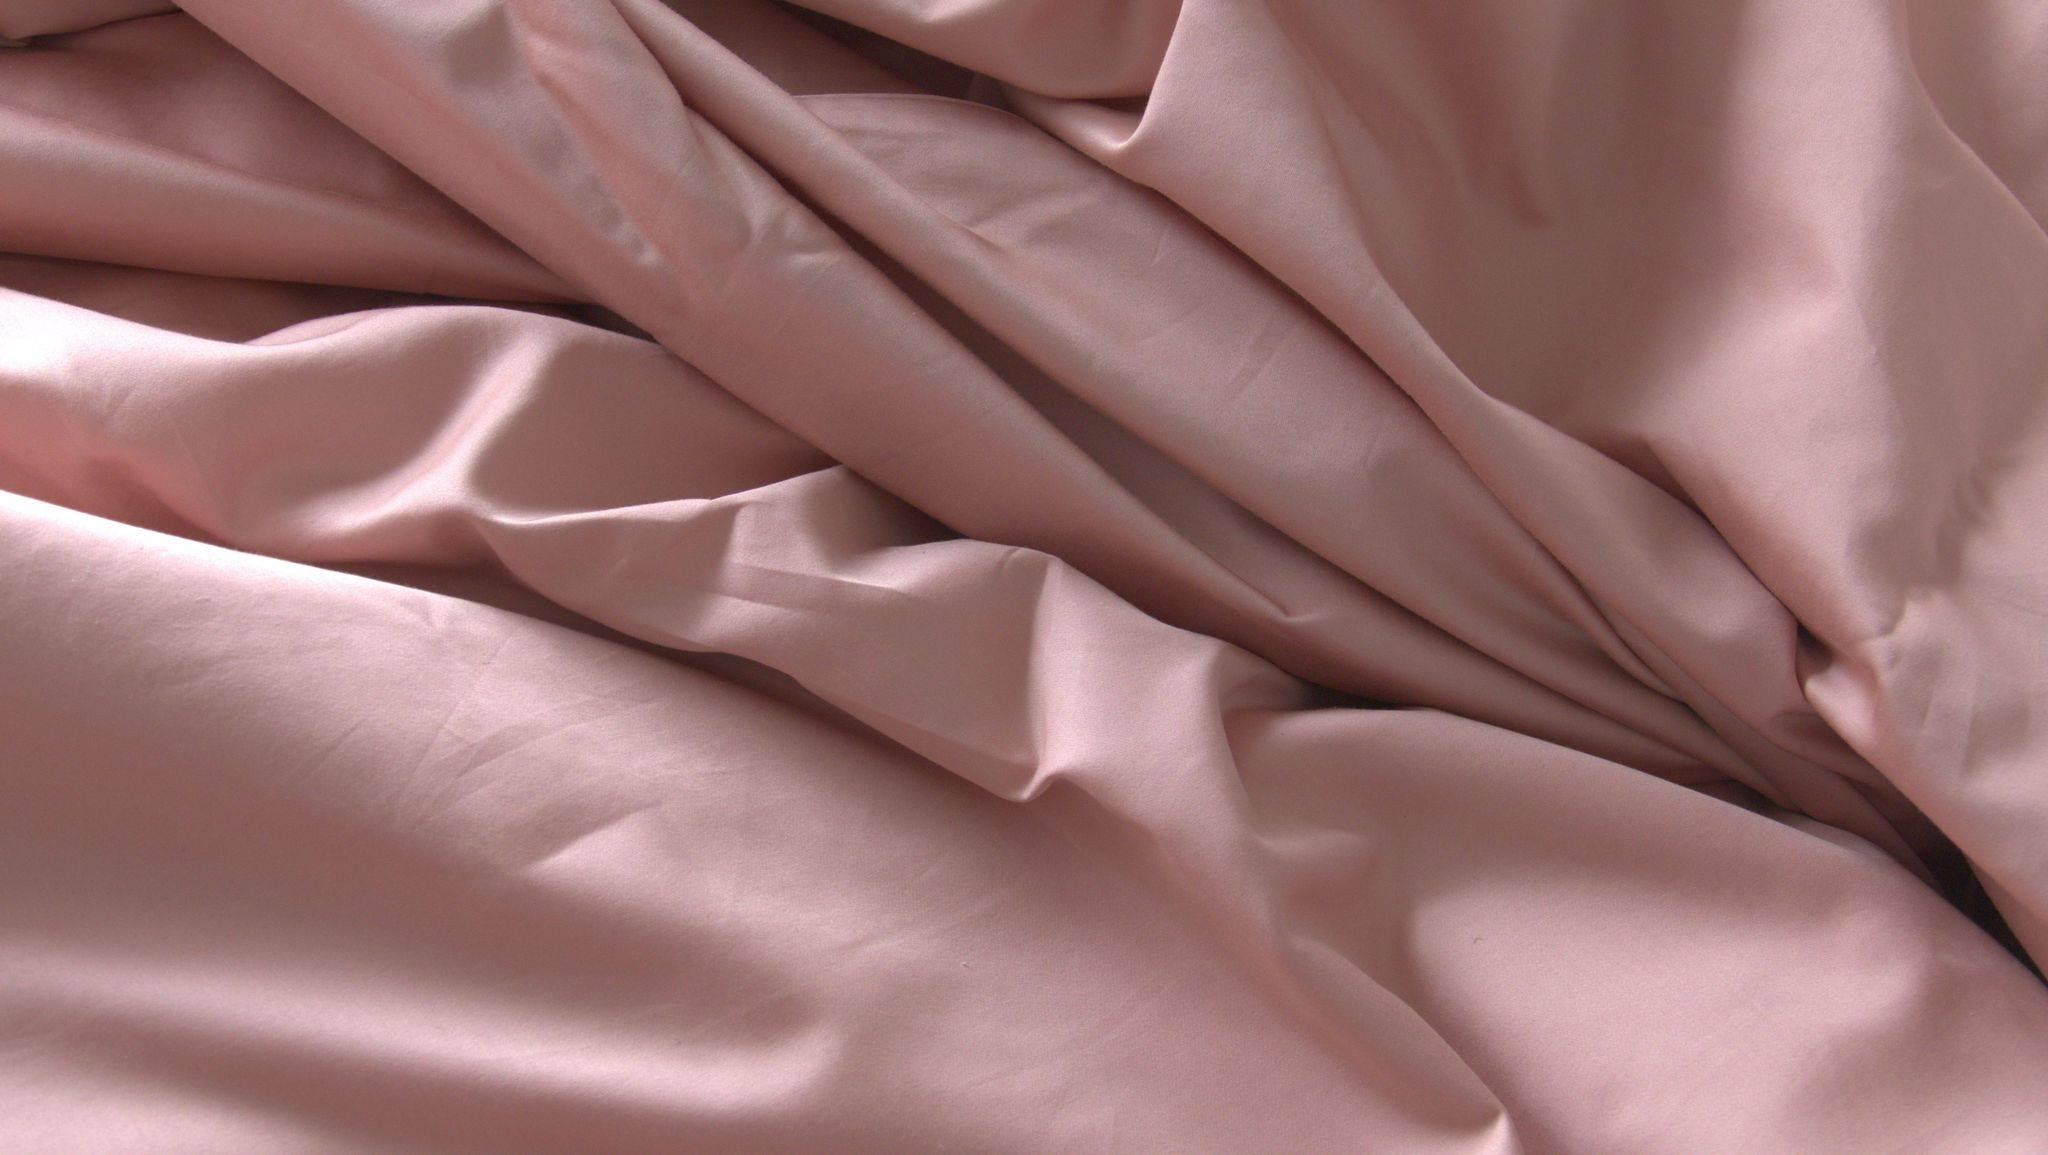 Featuring Weavve's Cotton Sheets in Tea Rose details